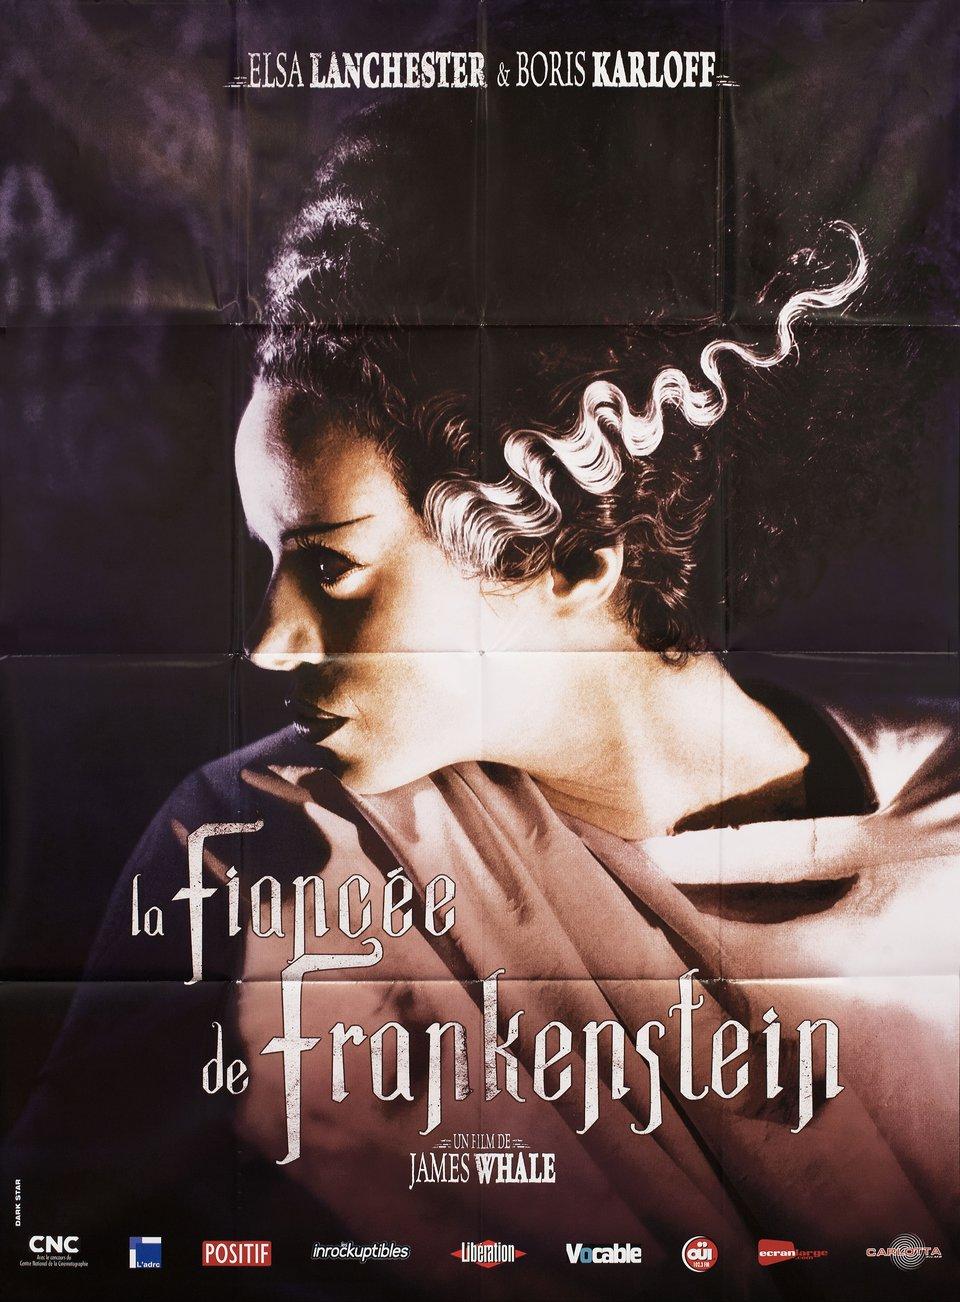 The Bride of Frankenstein R2013 French Grande Poster